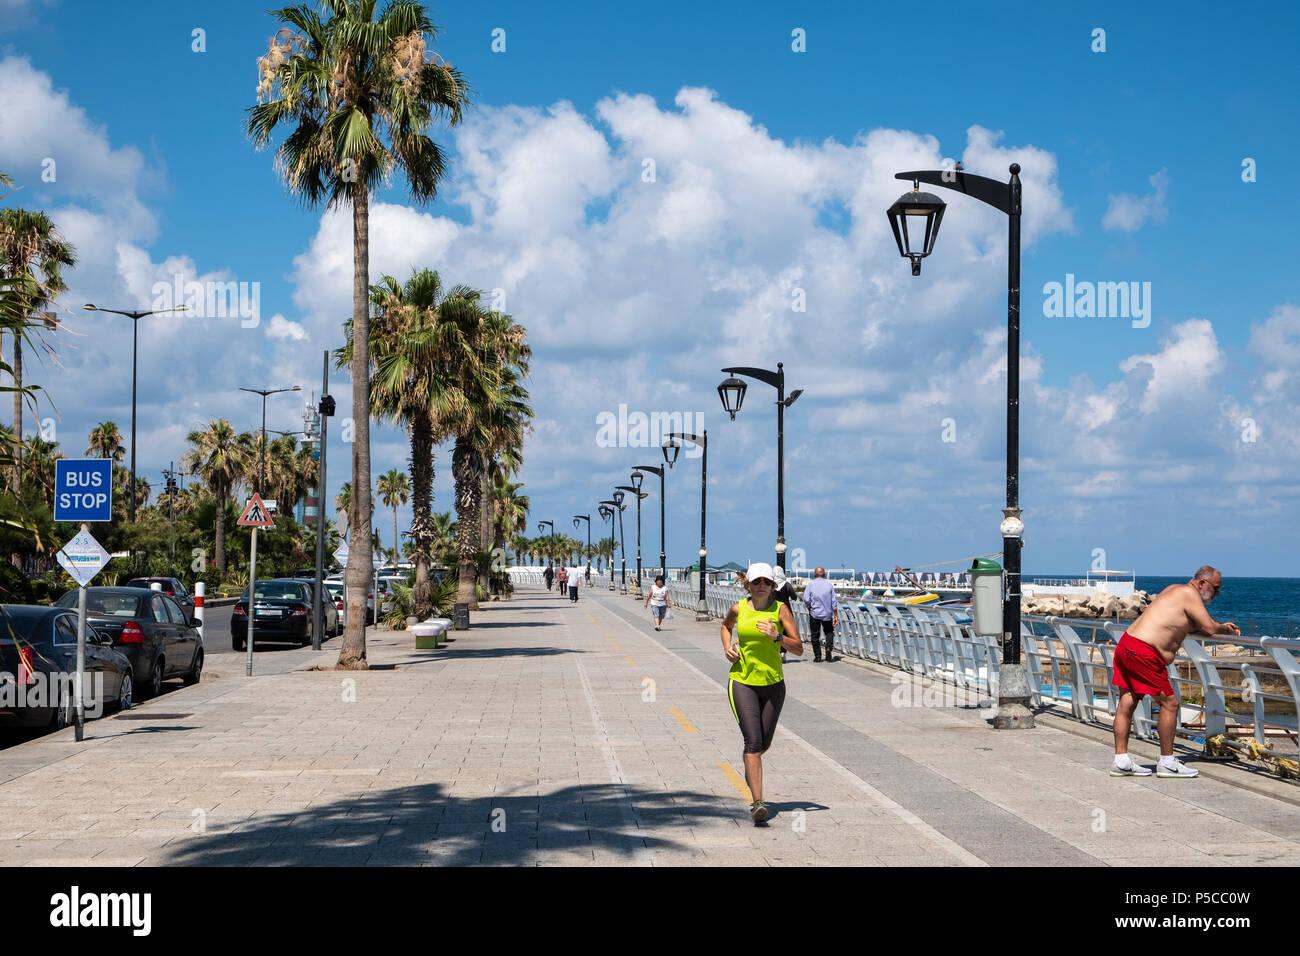 View along the  Corniche in Beirut, Lebanon. - Stock Image